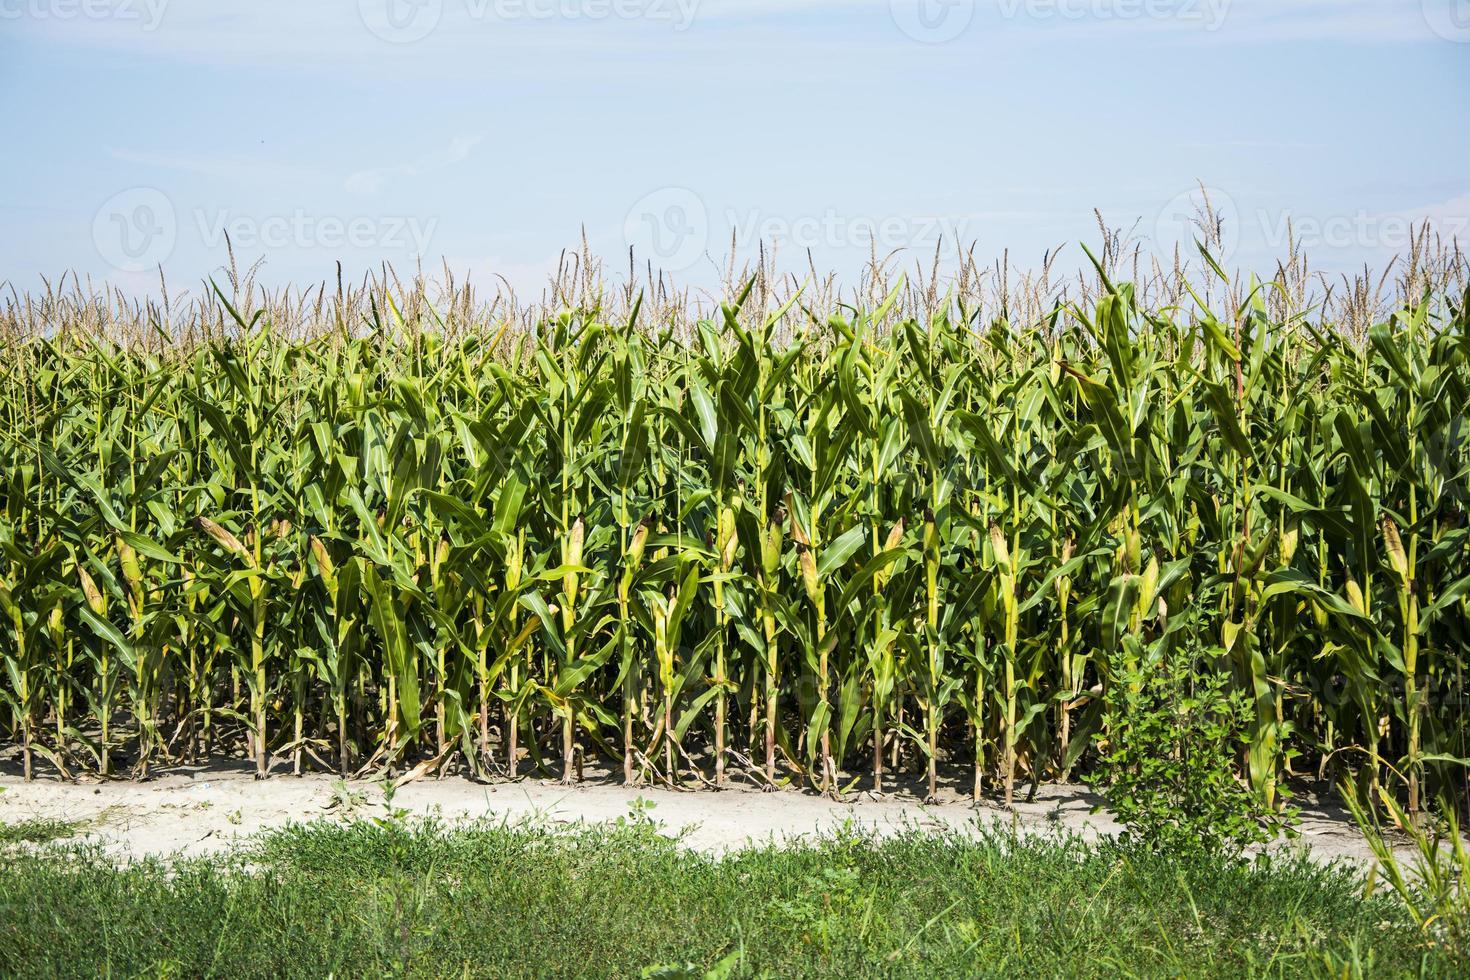 Corn field before harvest photo